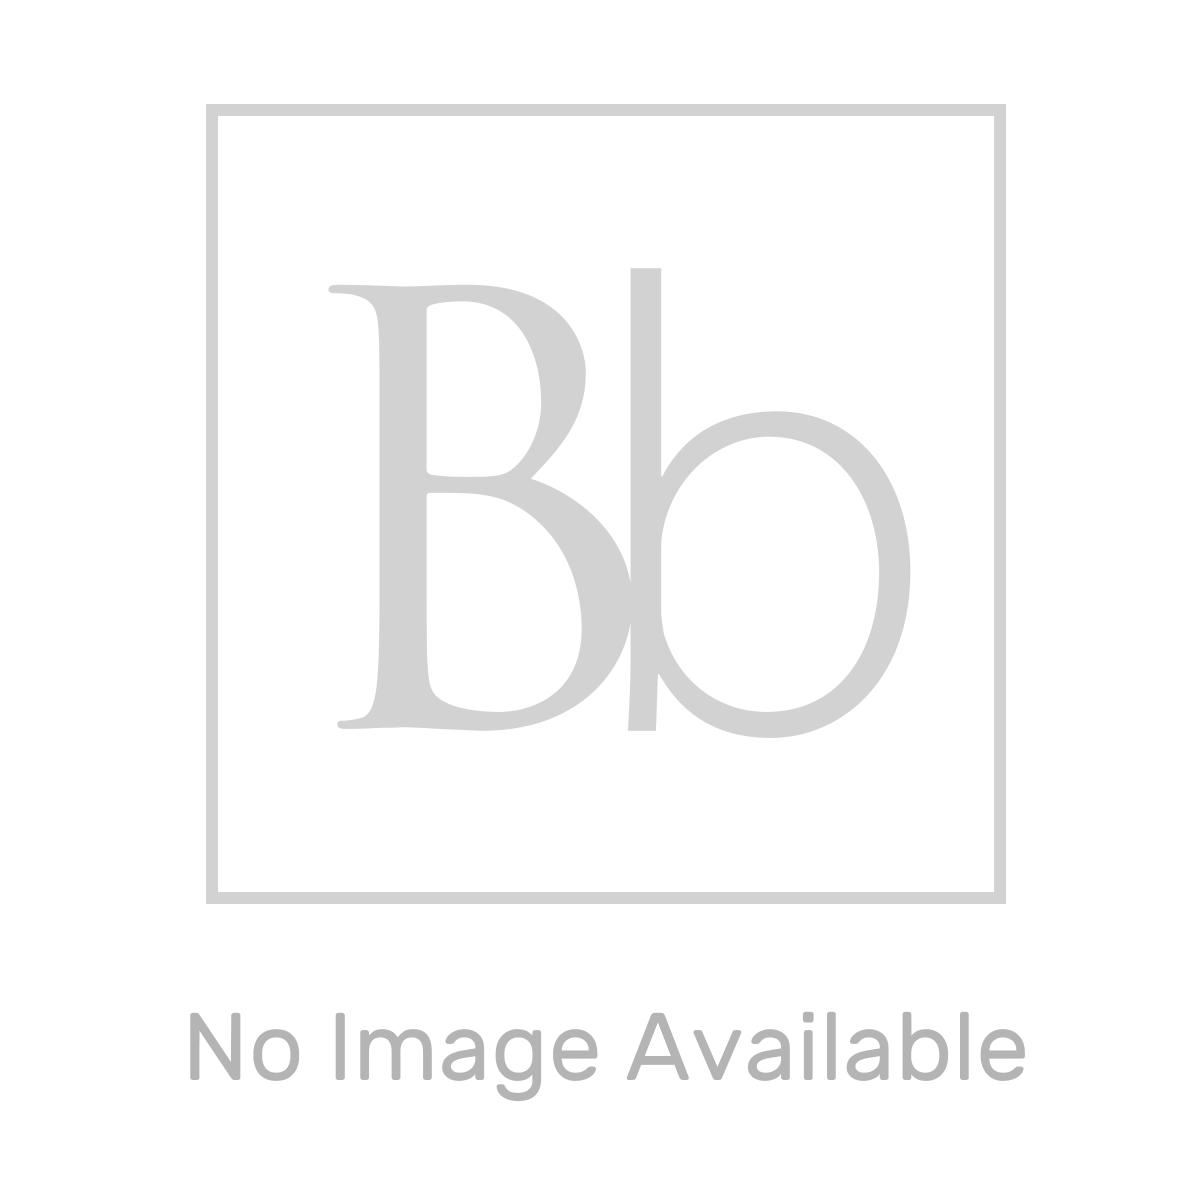 Croydex White Woven Stripe Textile Shower Curtain